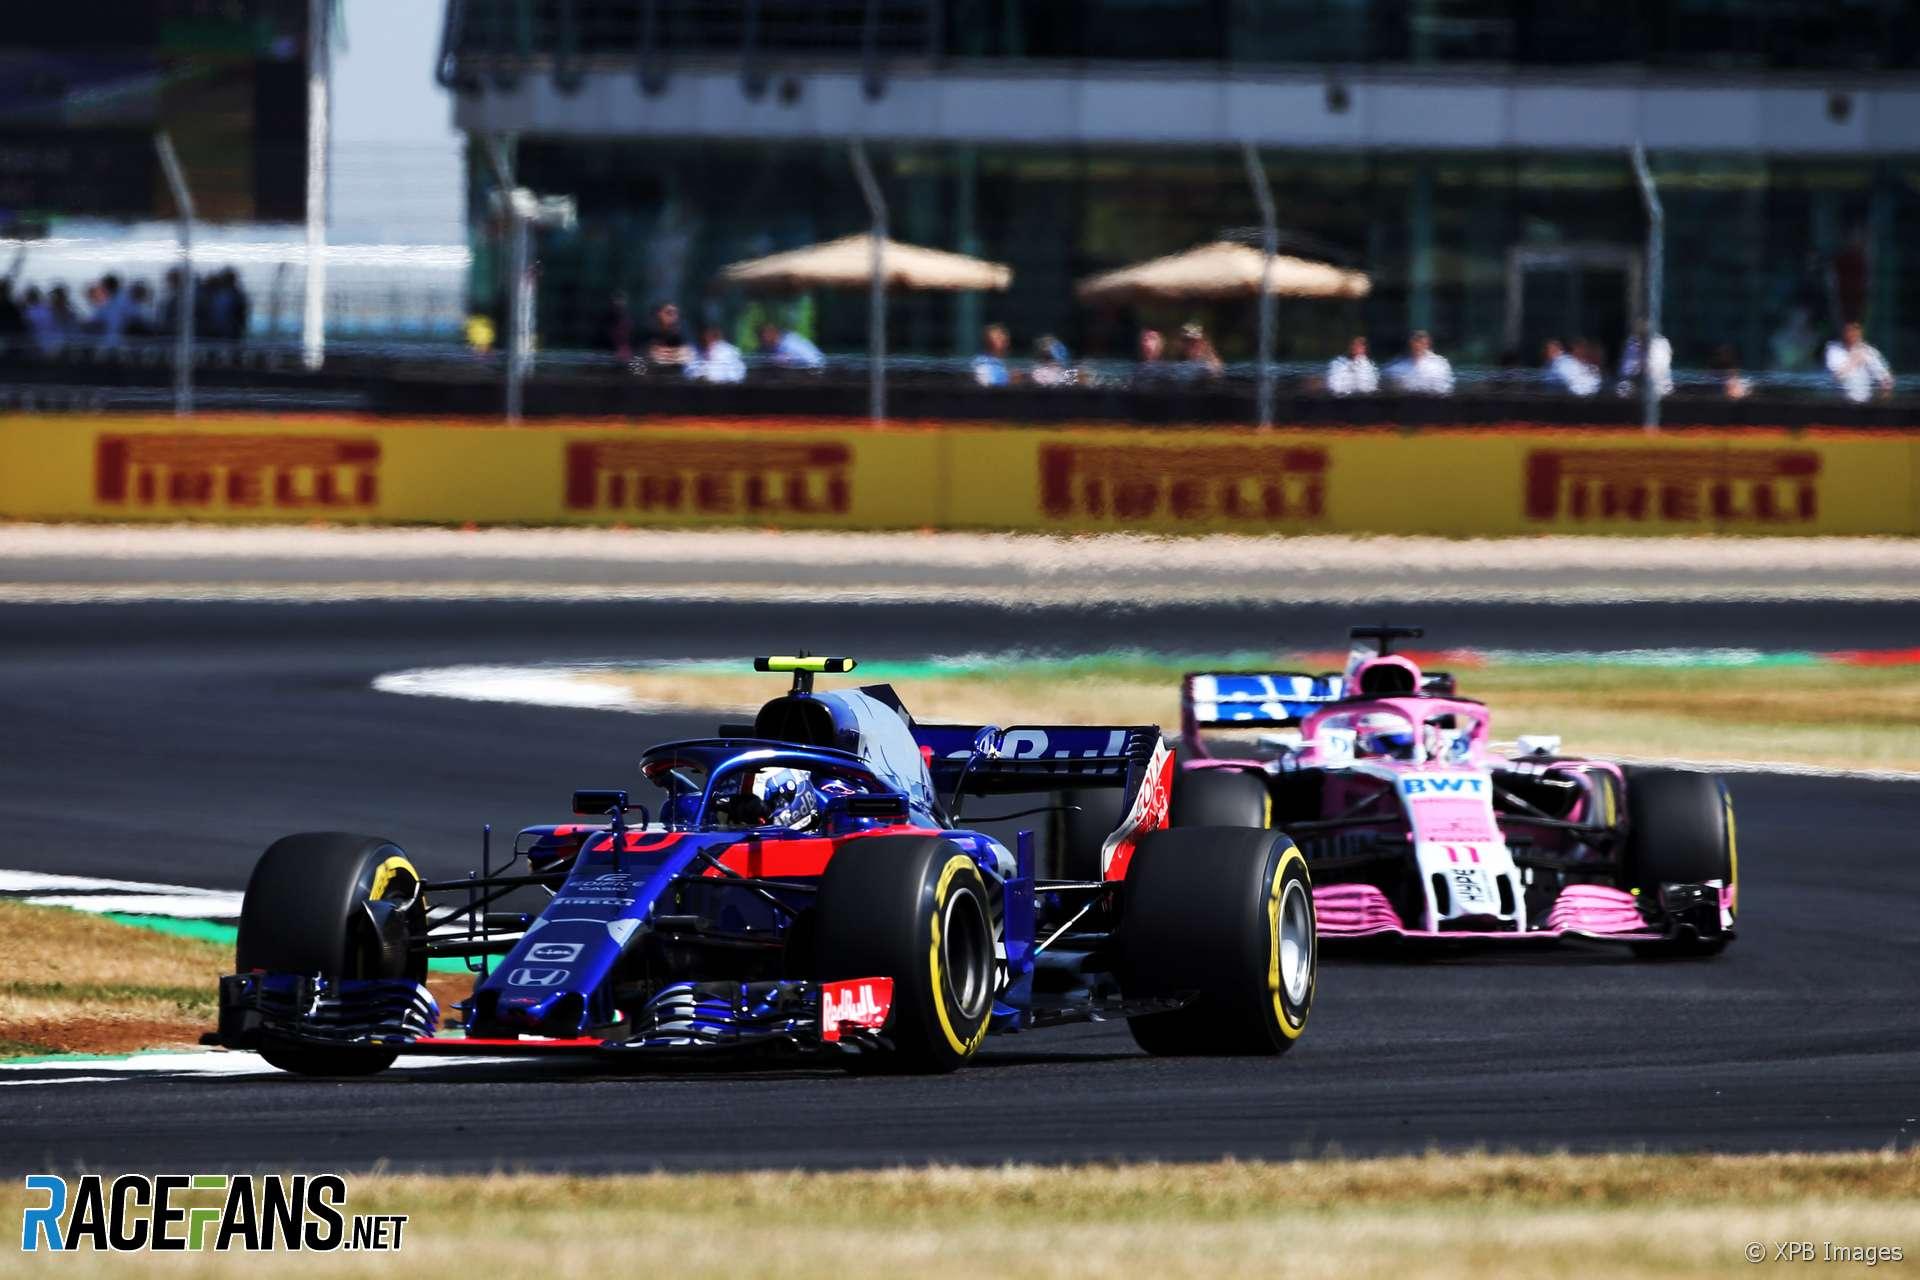 Pierre Gasly, Toro Rosso, Silverstone, 2018